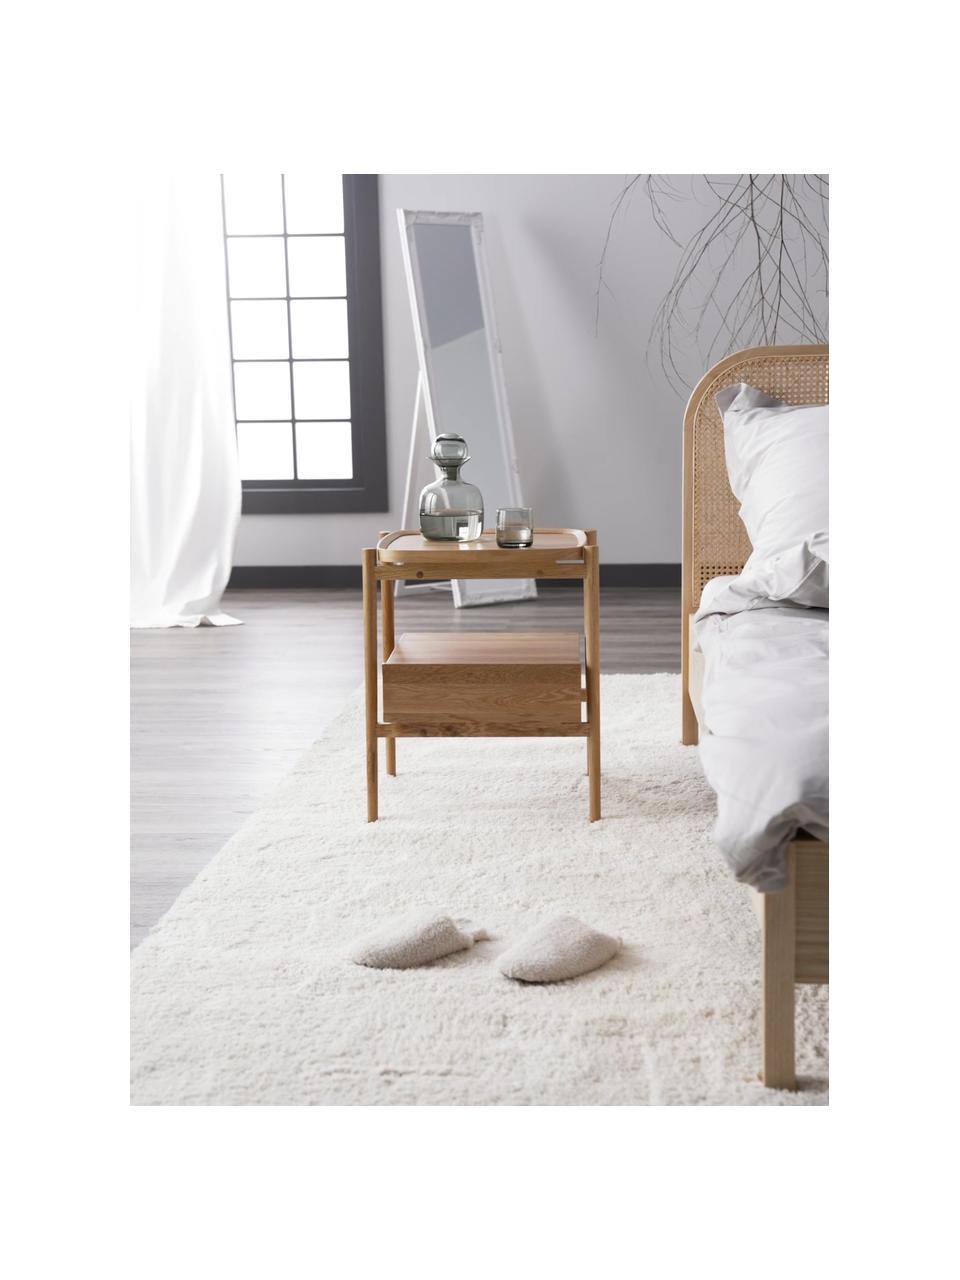 Table de chevet bois de chêne avec tiroir Libby, Brun clair